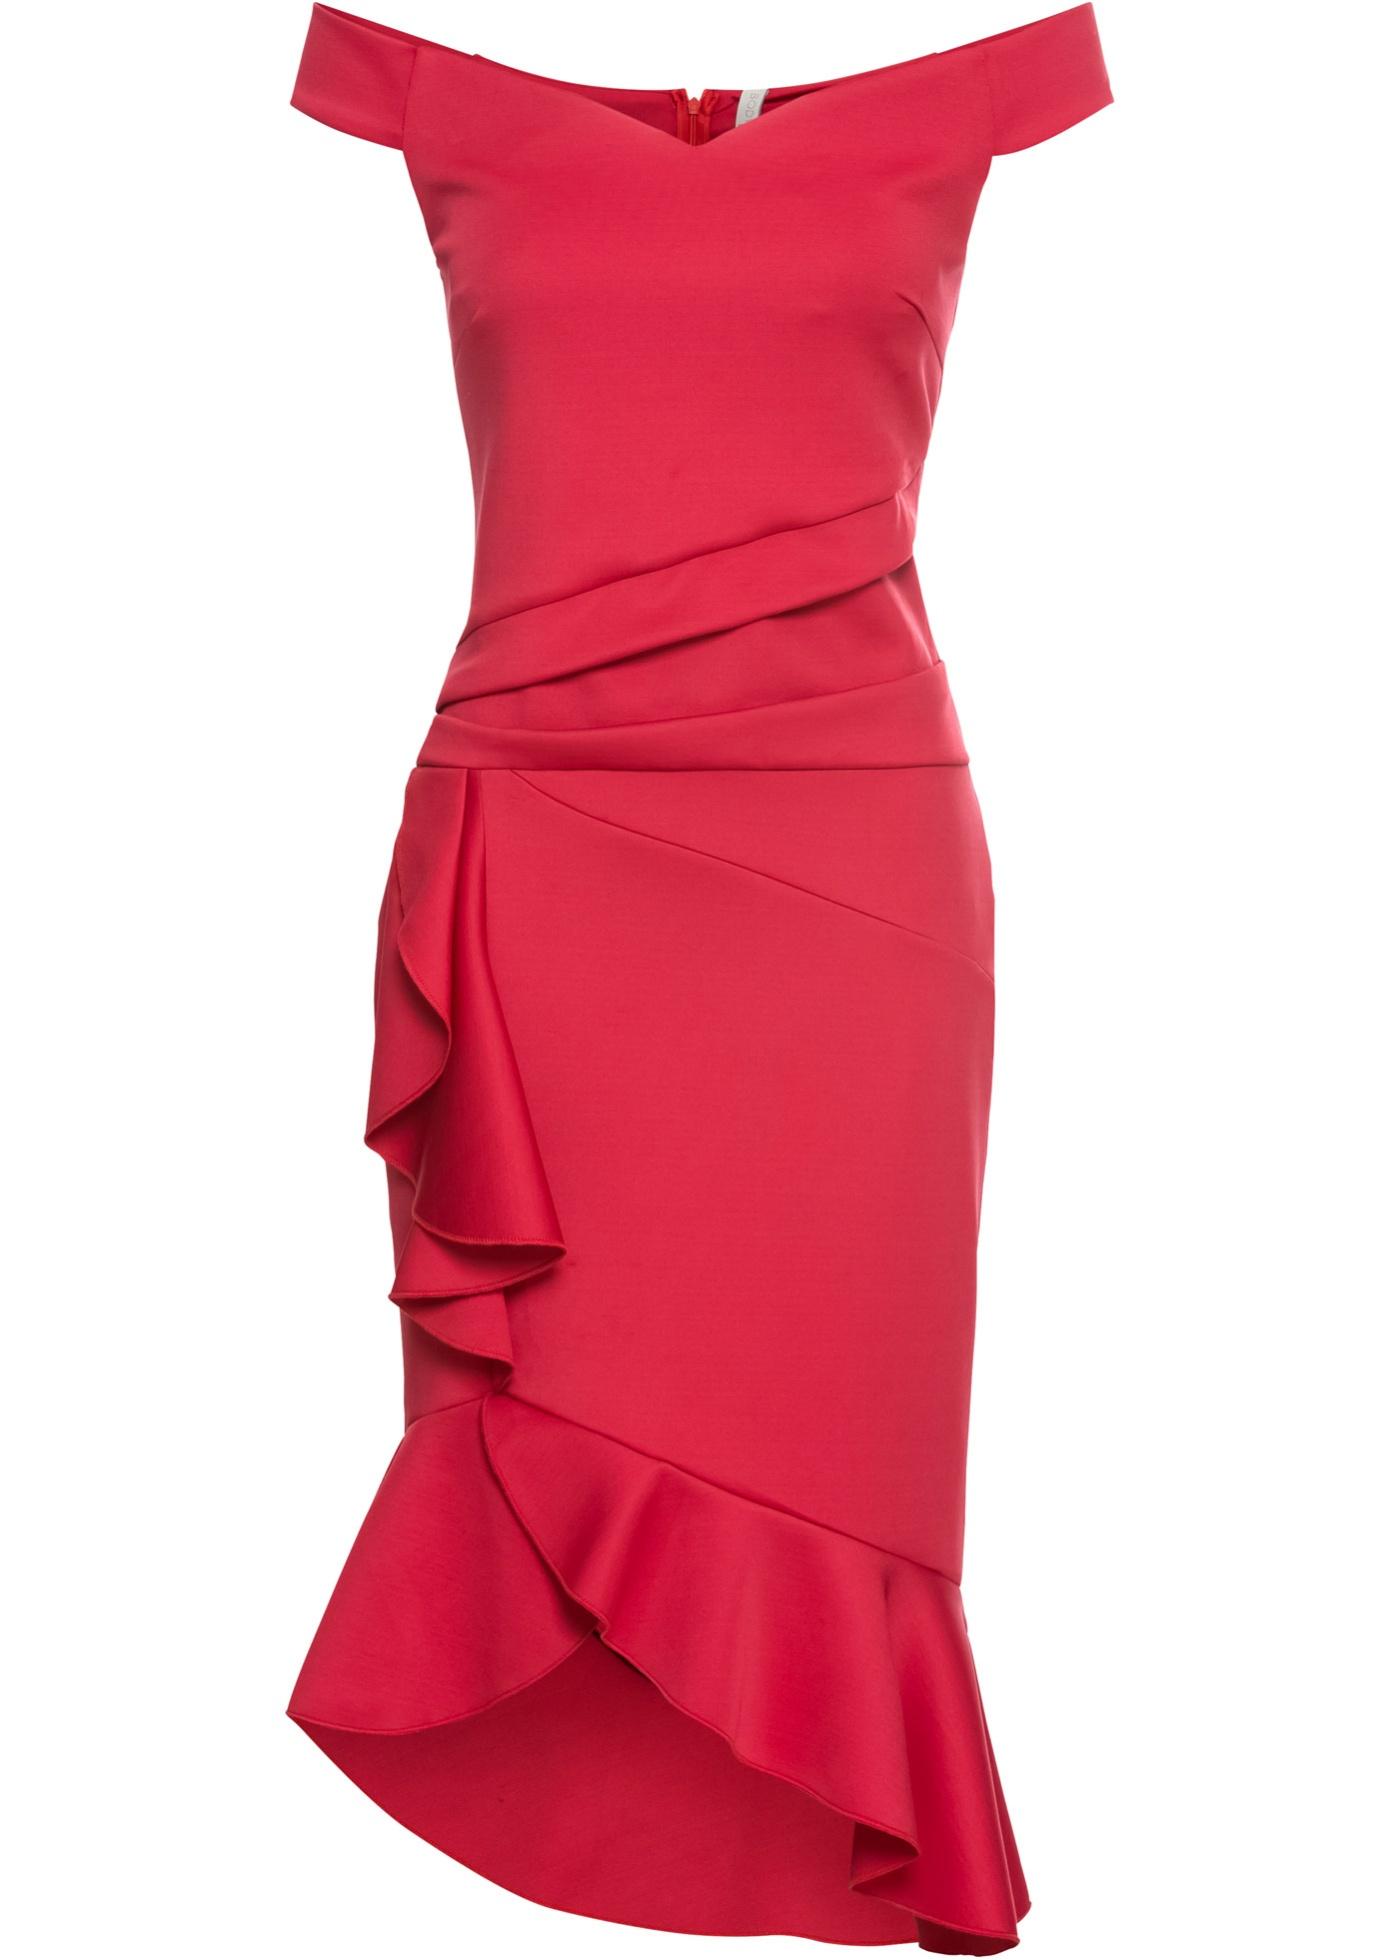 Off-Shoulder-Kleid mit Volants Gr. 40/42 Rot Abendkleid ...